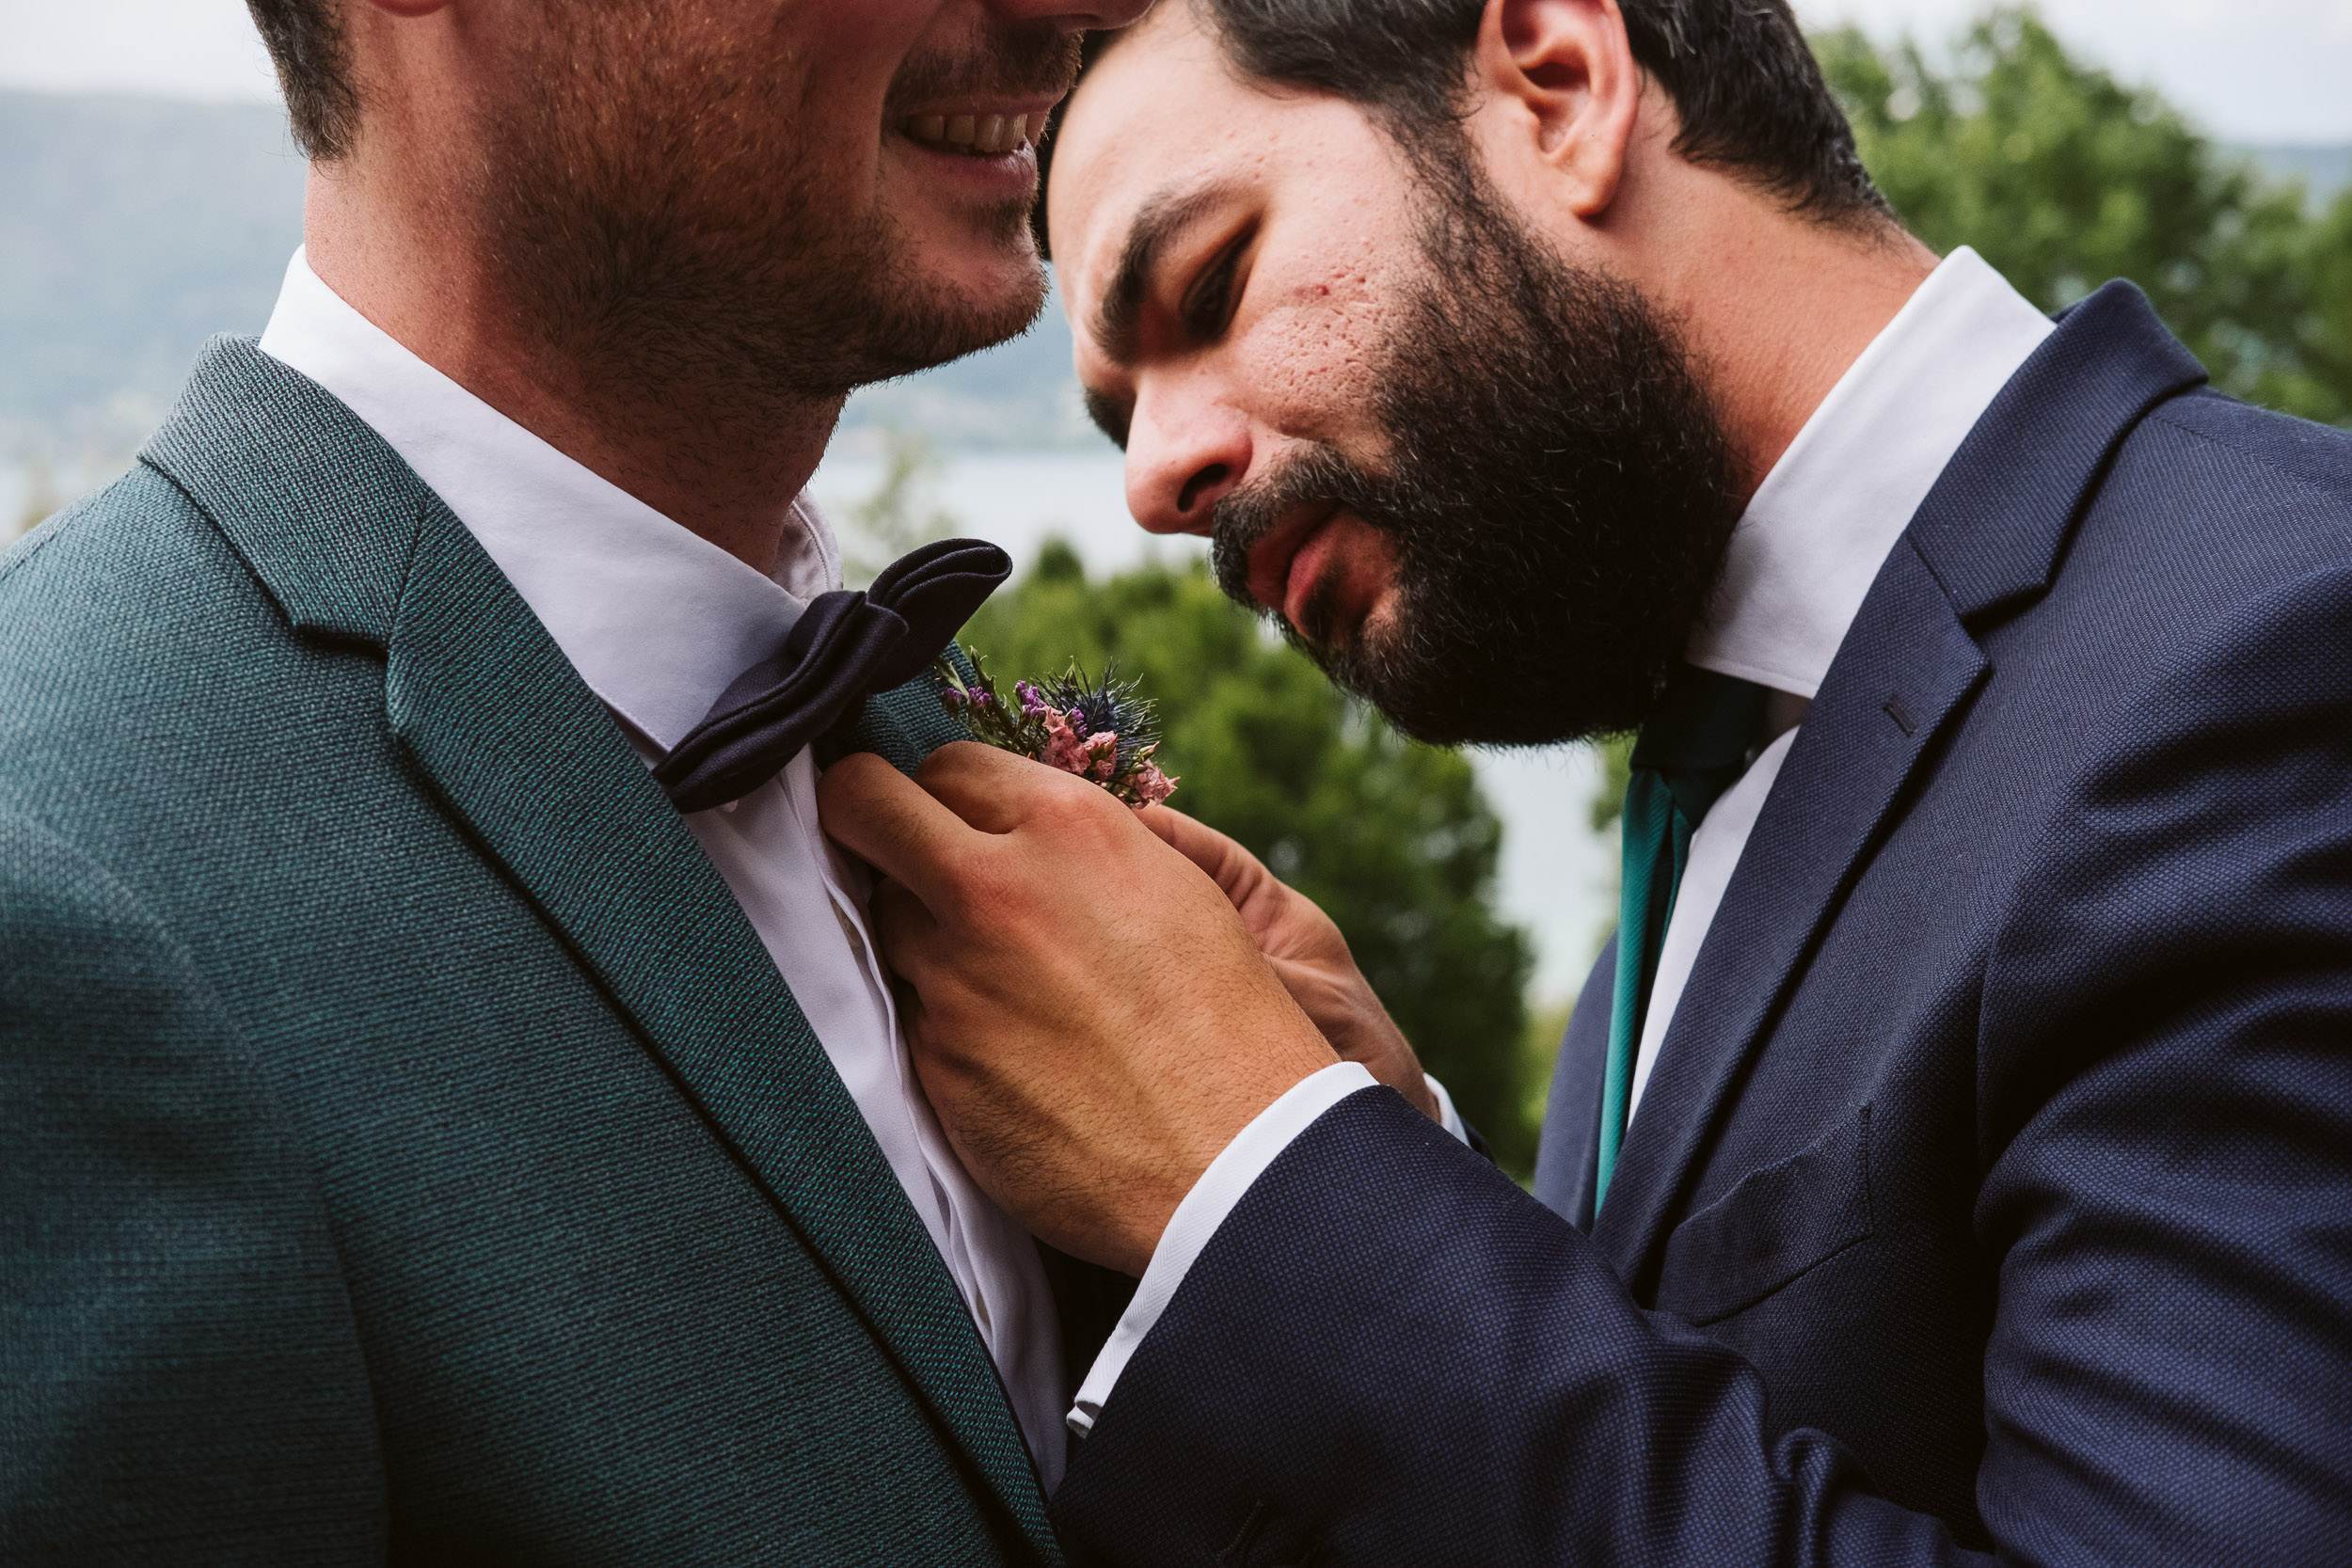 gerald-mattel-photographe-mariage-annecy-verrier-menthon-3.jpg